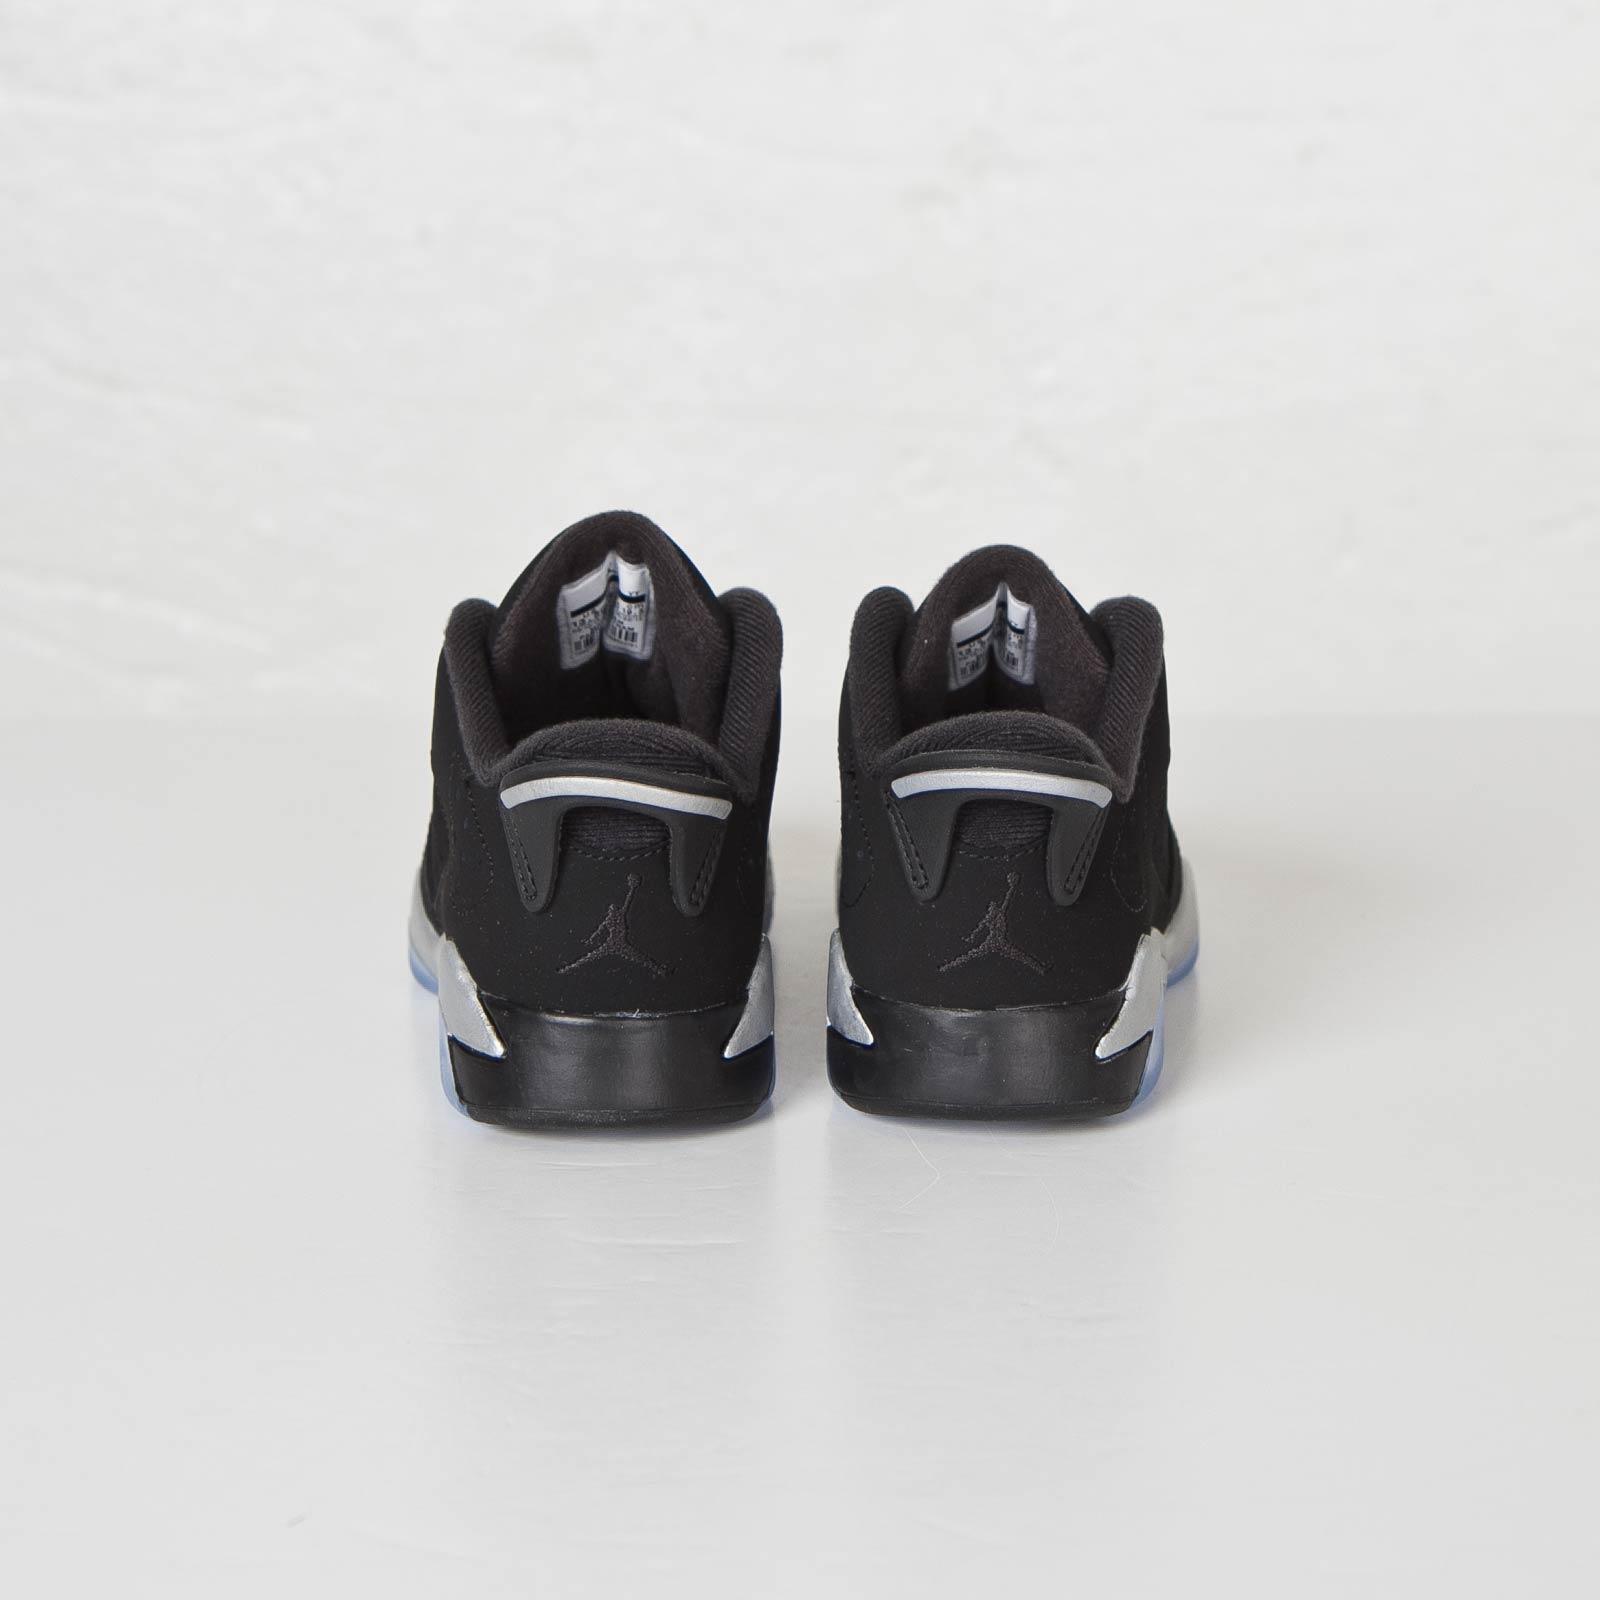 5f37ca9a977 Jordan Brand Air Jordan 6 retro Low (PS) - 768882-003 - Sneakersnstuff    sneakers & streetwear online since 1999